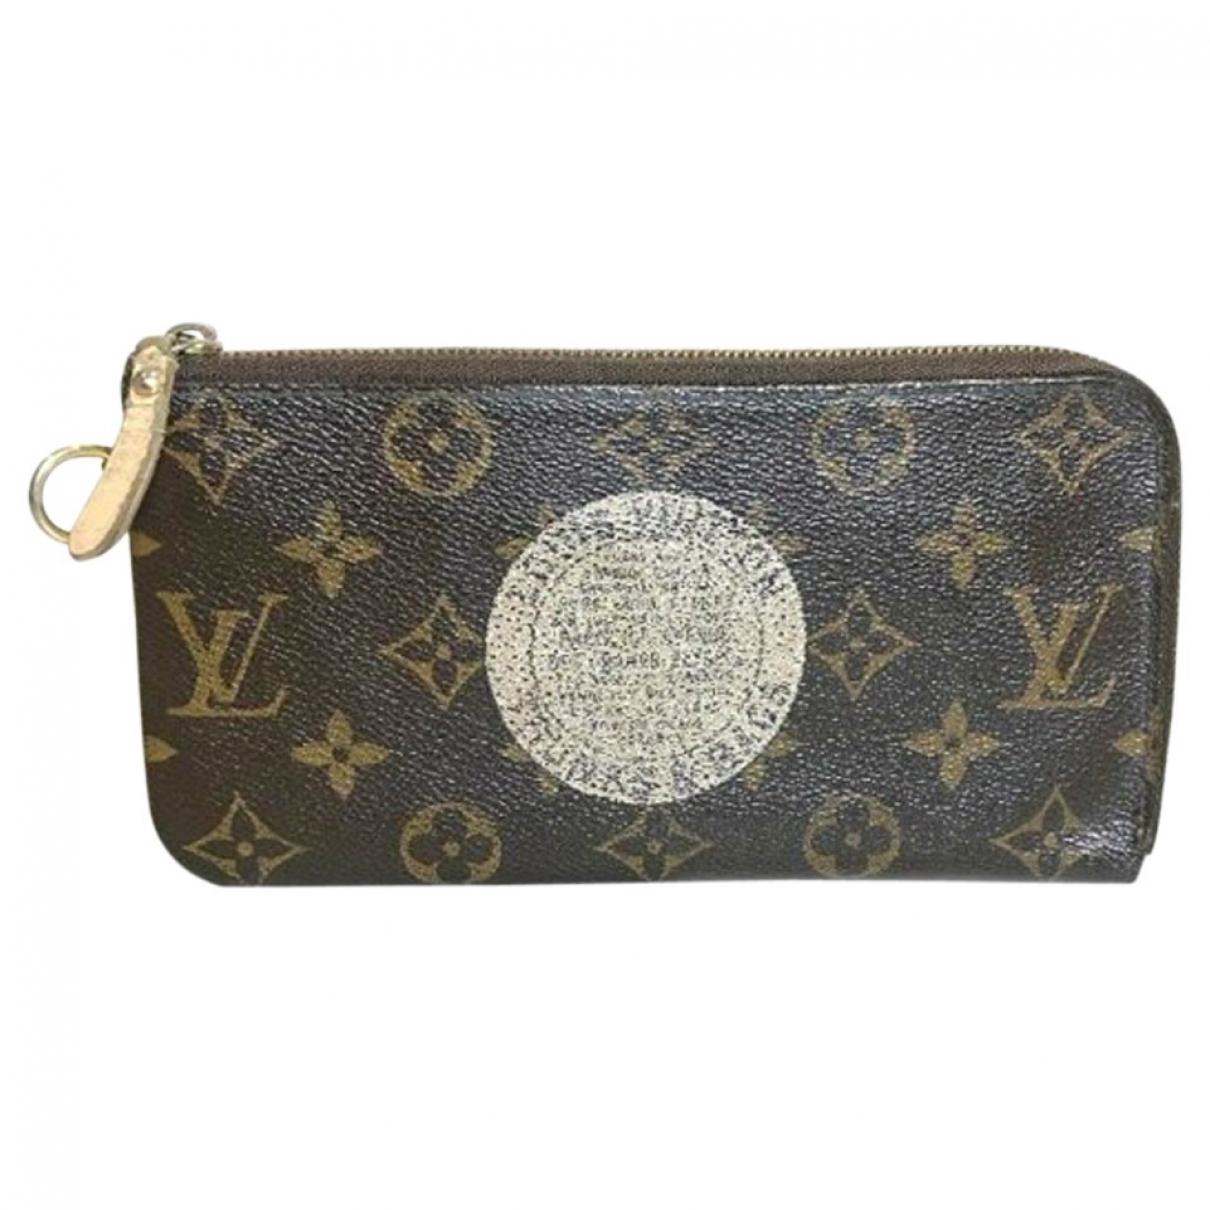 Cartera Ikat de Lona Louis Vuitton